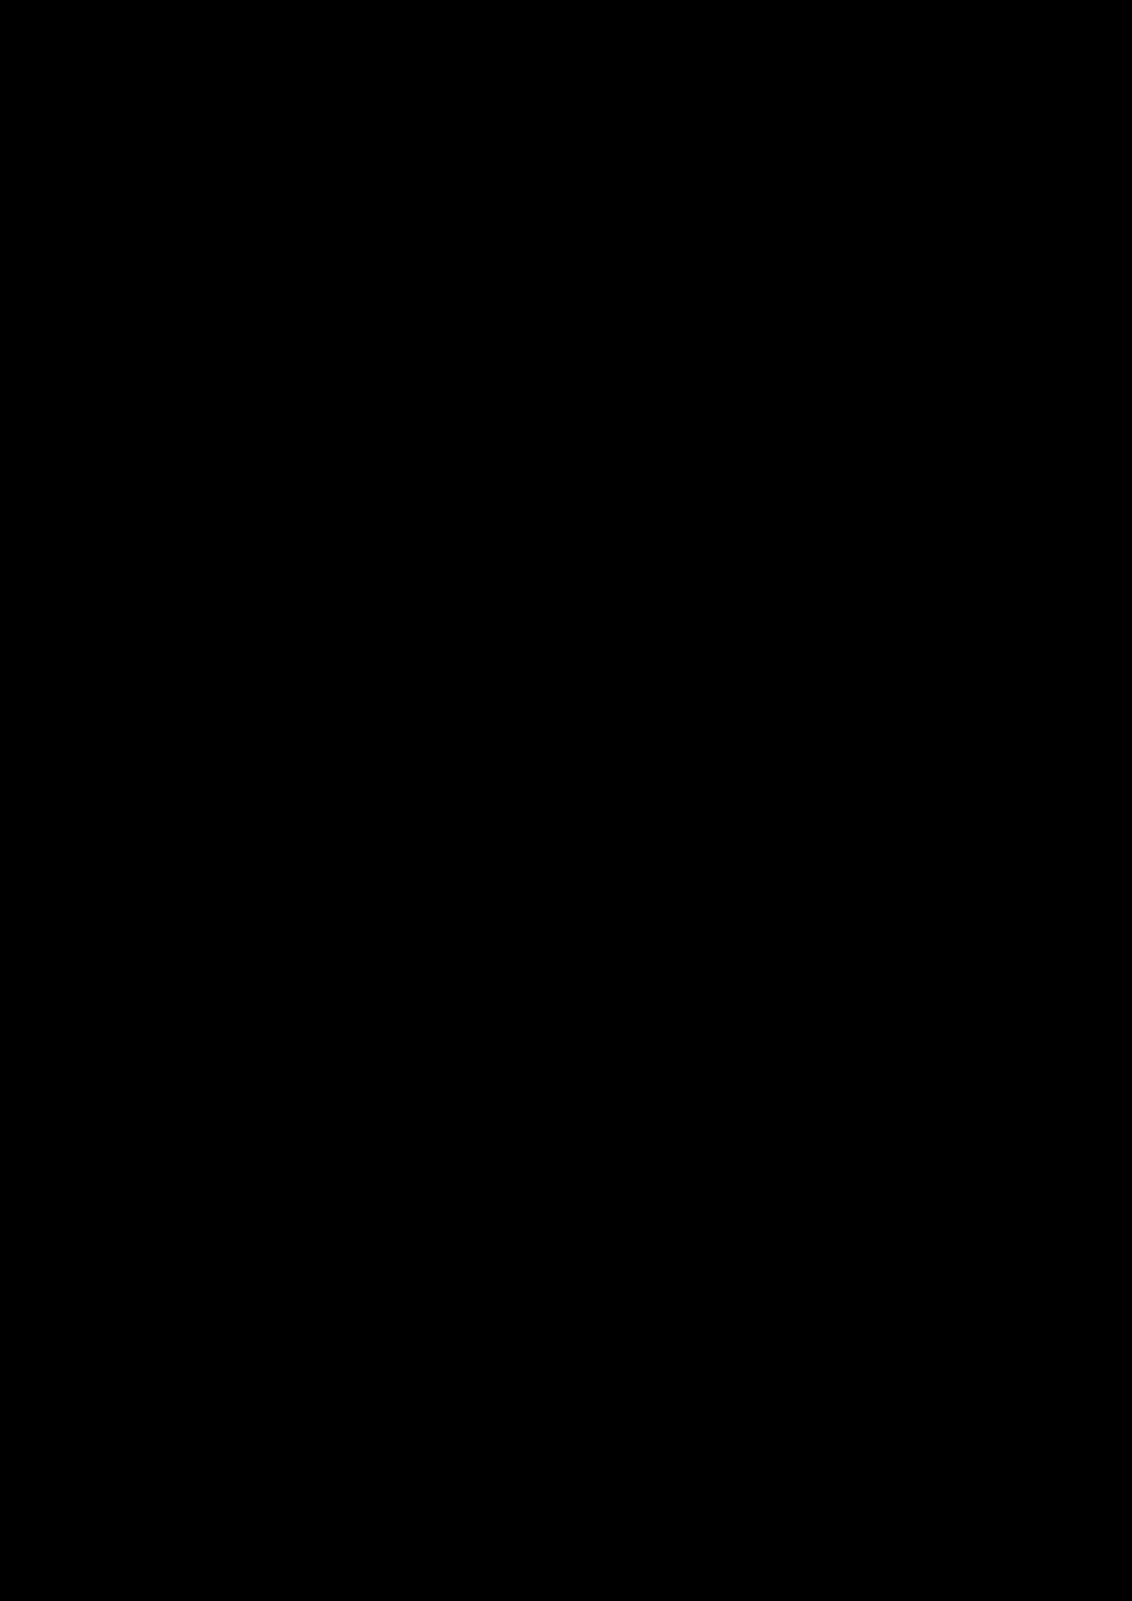 Menshe nas slide, Image 8